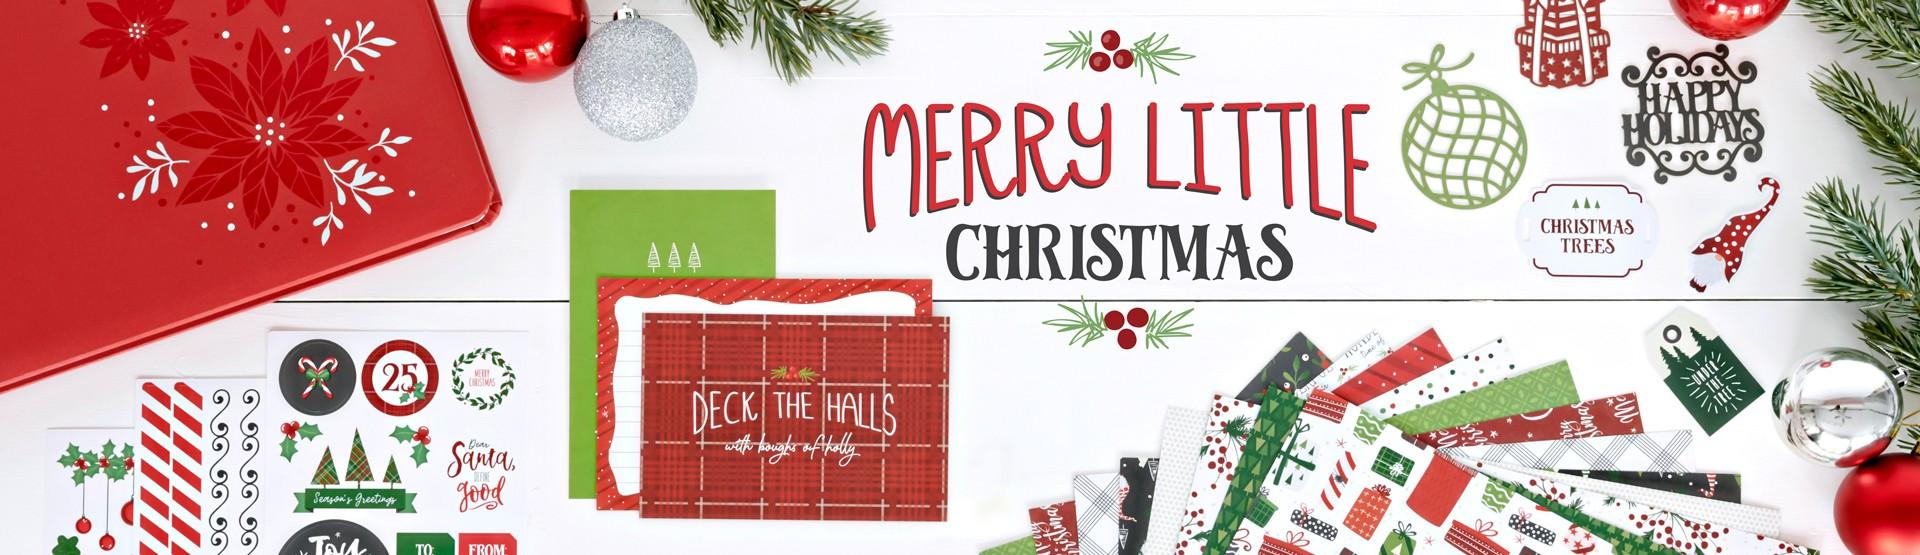 Christmas & Holidays: Merry Little Christmas